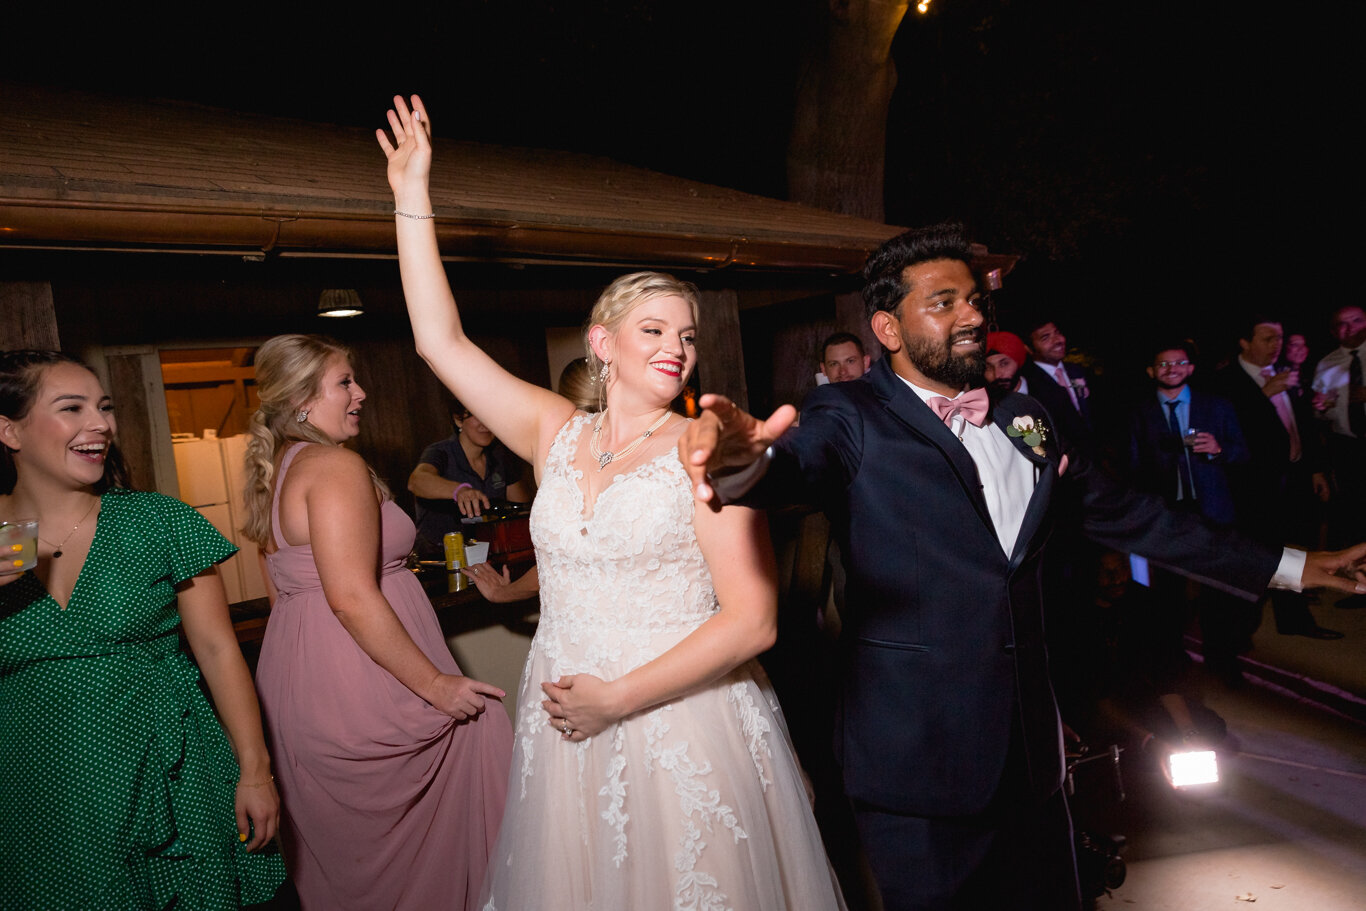 2019.08.24_Emily-Ashir-Wedding-at-the-Maples-6573.jpg